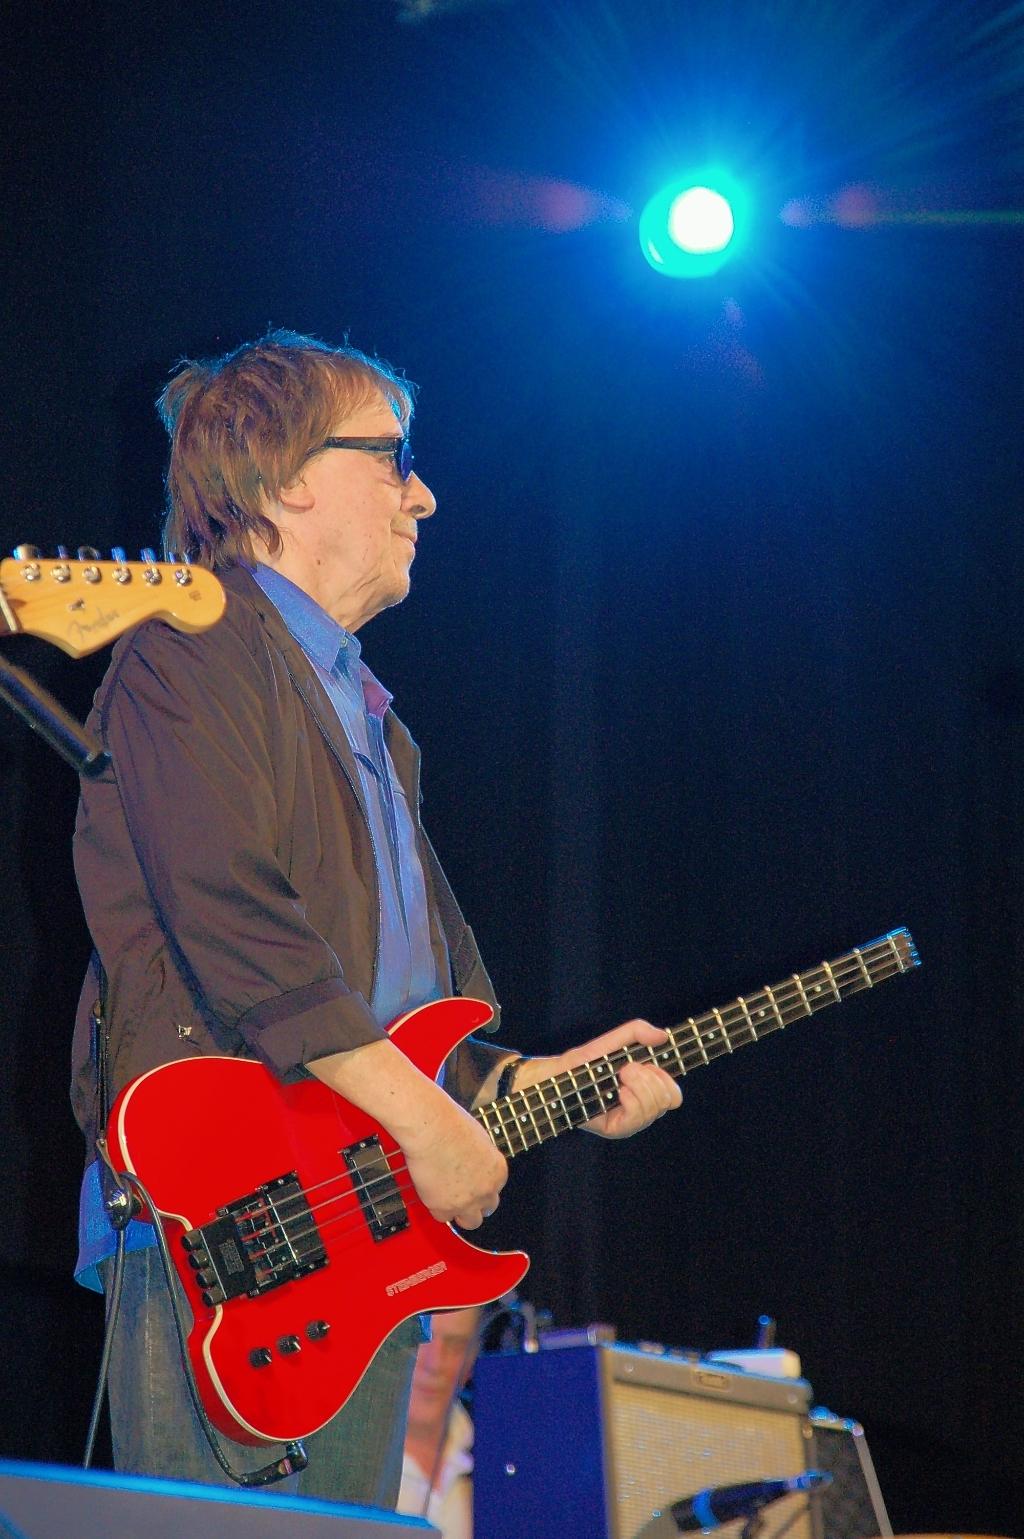 <p>Oplossing fotoquiz 37: Ede, CineMec: concert voormalig Rolling Stones bassist Bill Wyman met zijn Rhythm Kings; januari 2010.</p> <p>Henny Jansen</p> © BDU Media